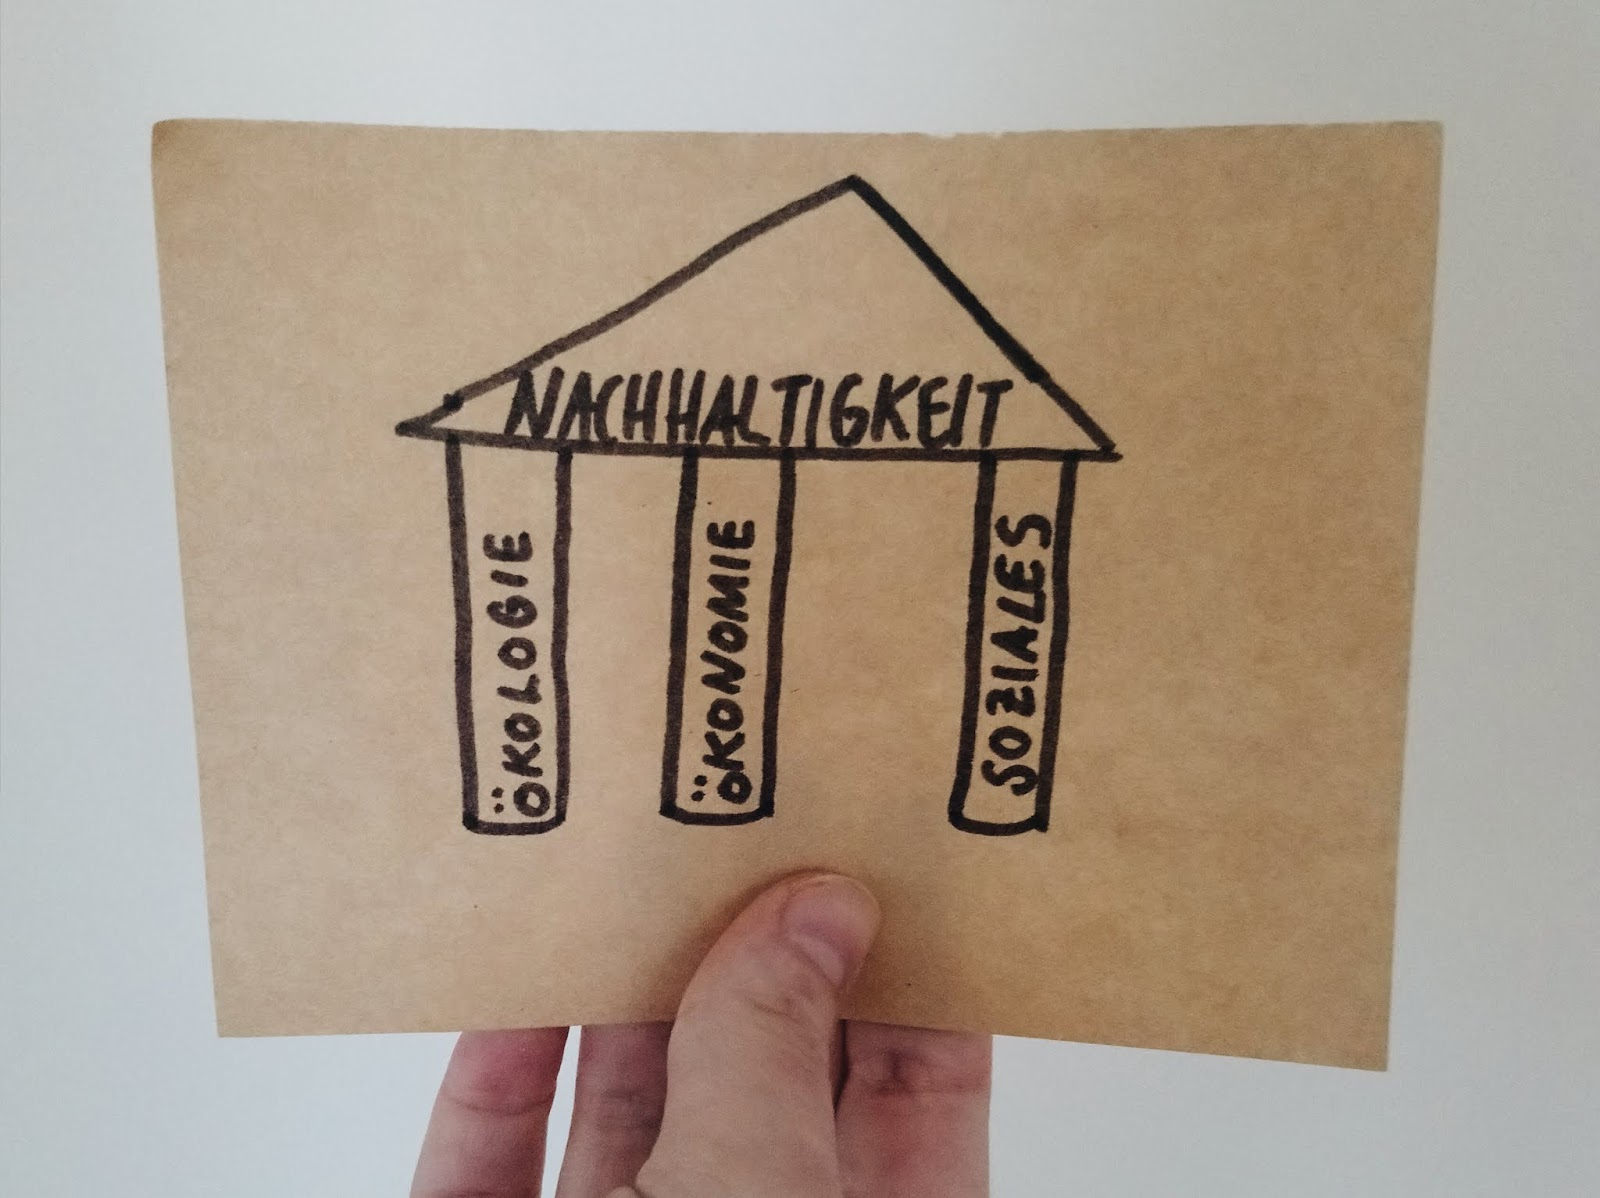 drei-säulen-nachhaltigkeit-ökologie-ökonomie-soziales